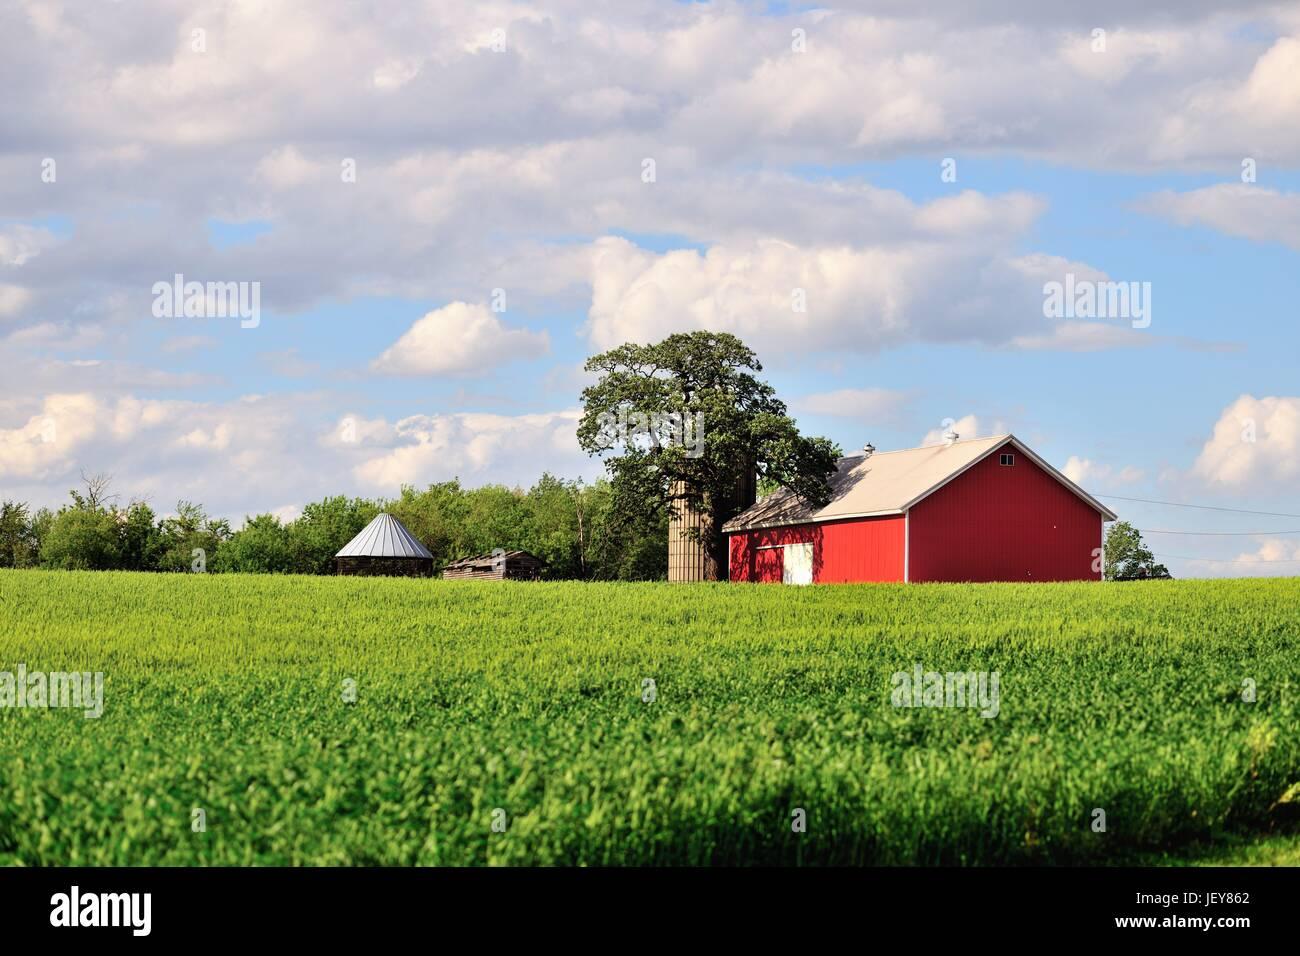 Red barn and silos near create a serene agricultural landscape on a farm in Burlington, Illinois, USA. - Stock Image